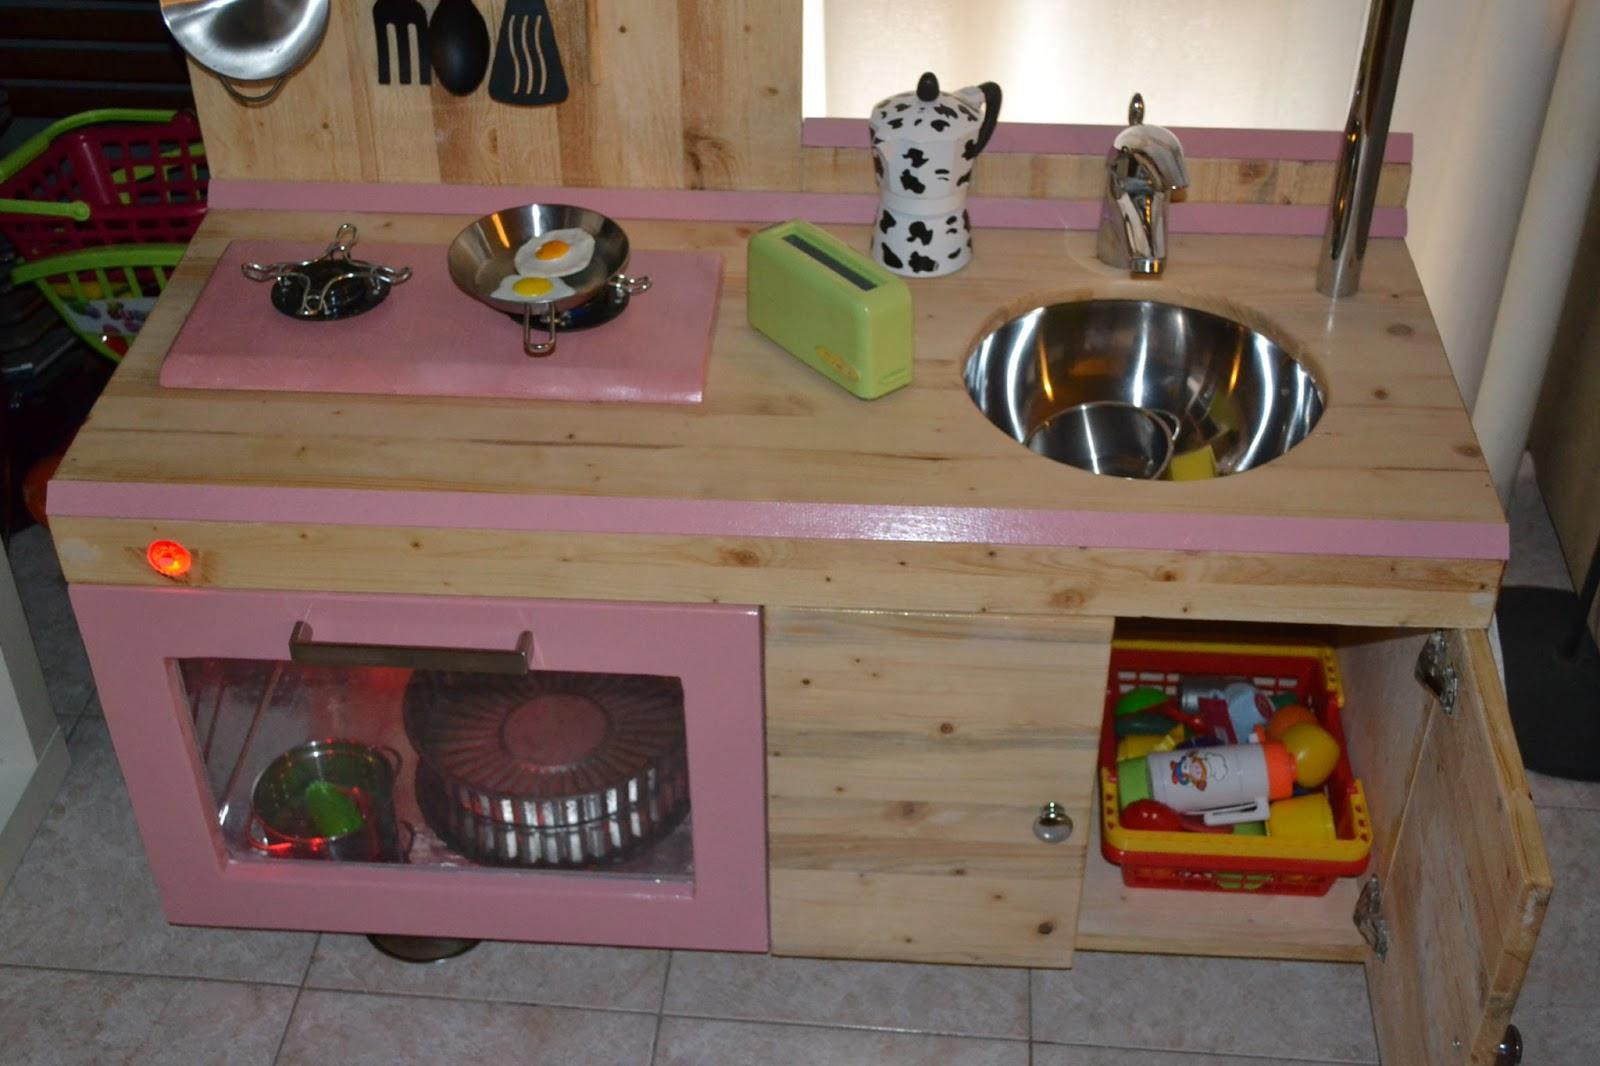 Mammarum come costruire una cucina per bambini di legno - Fai da te mobili cucina ...